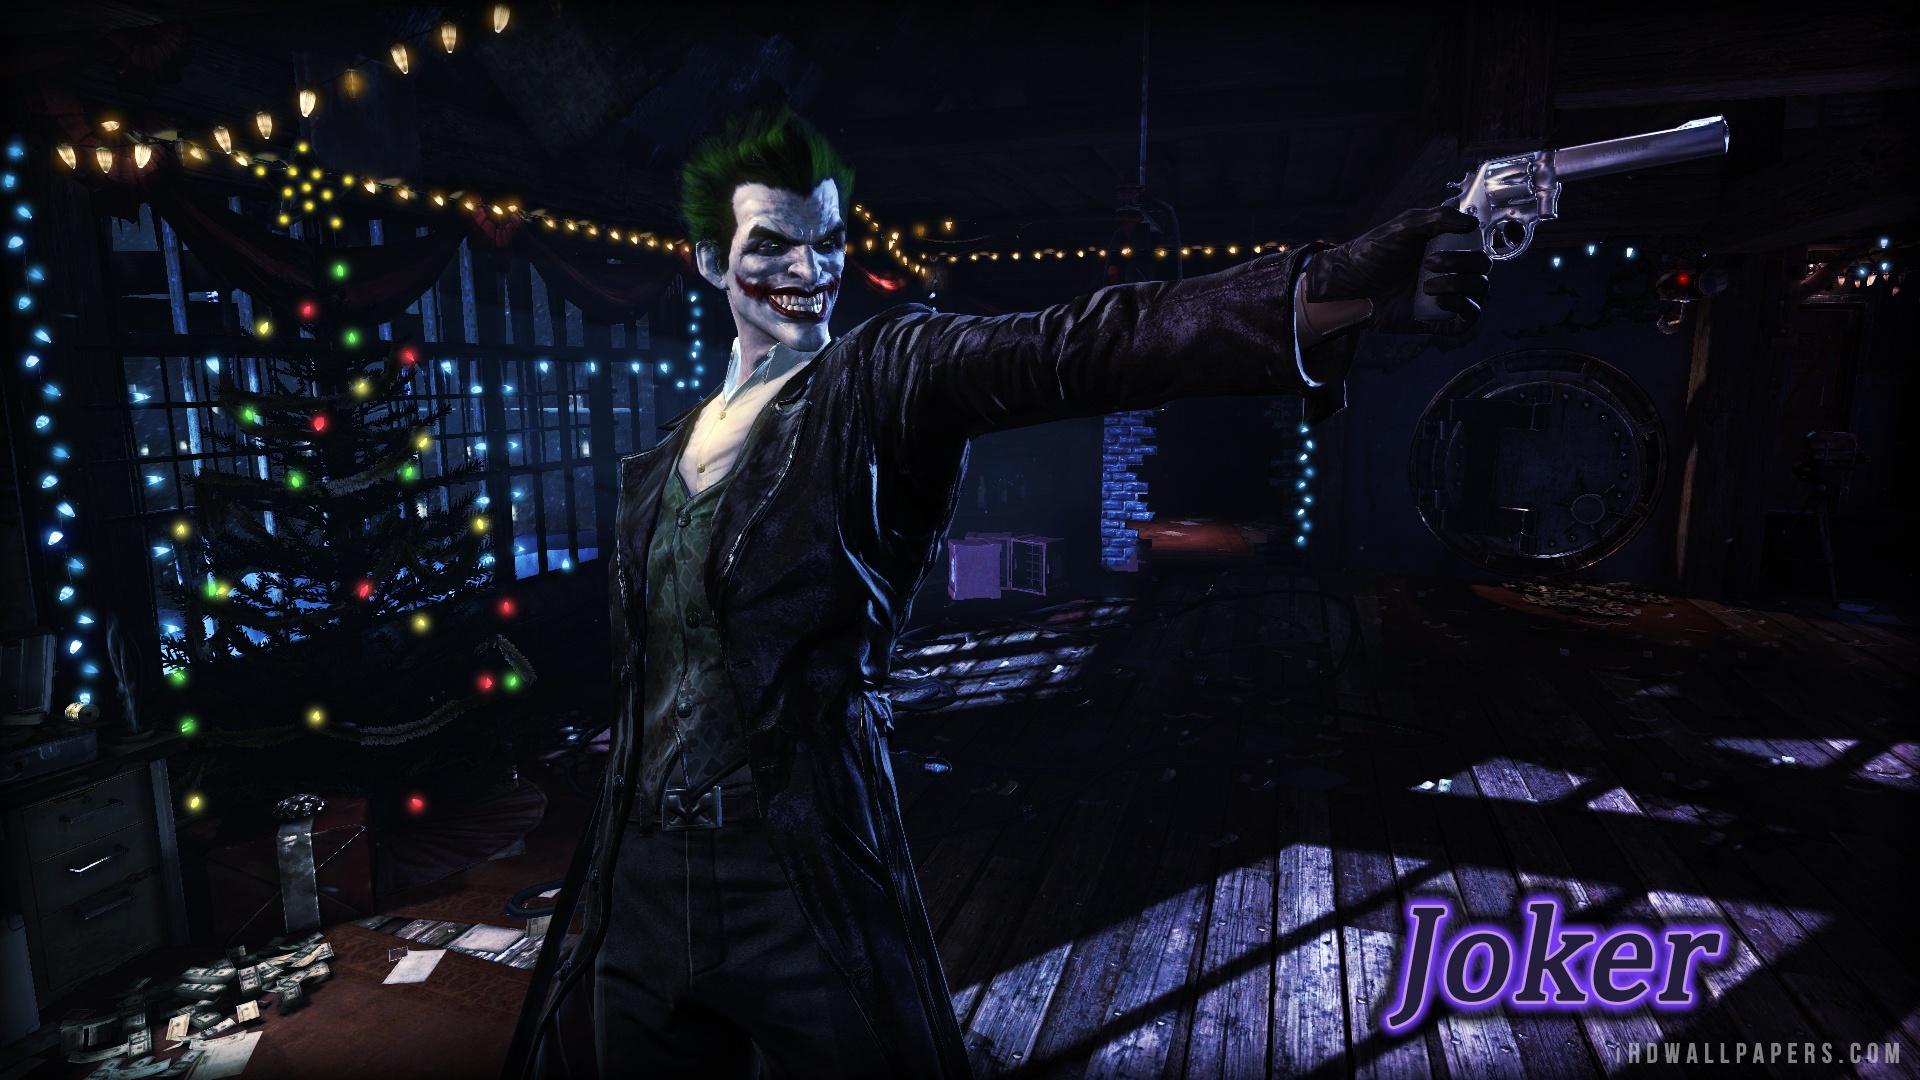 Batman Arkham Origins Joker HD Wallpaper   iHD Wallpapers 1920x1080